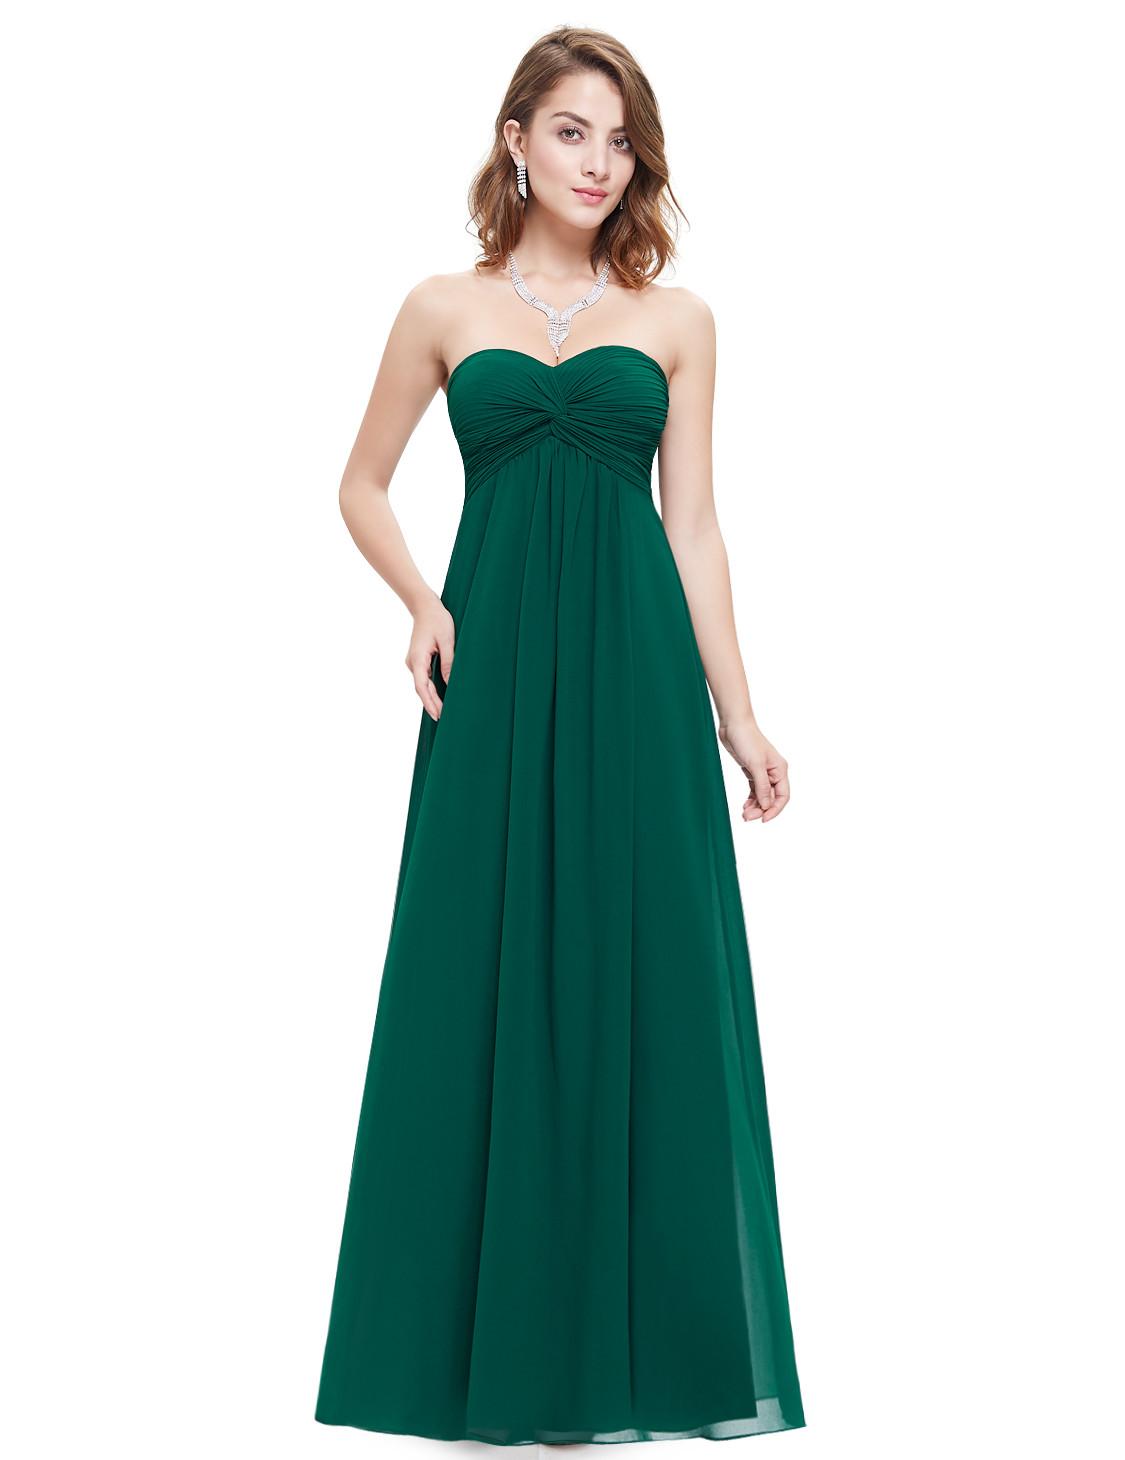 Strapless Elegant Green Bridesmaids Dress